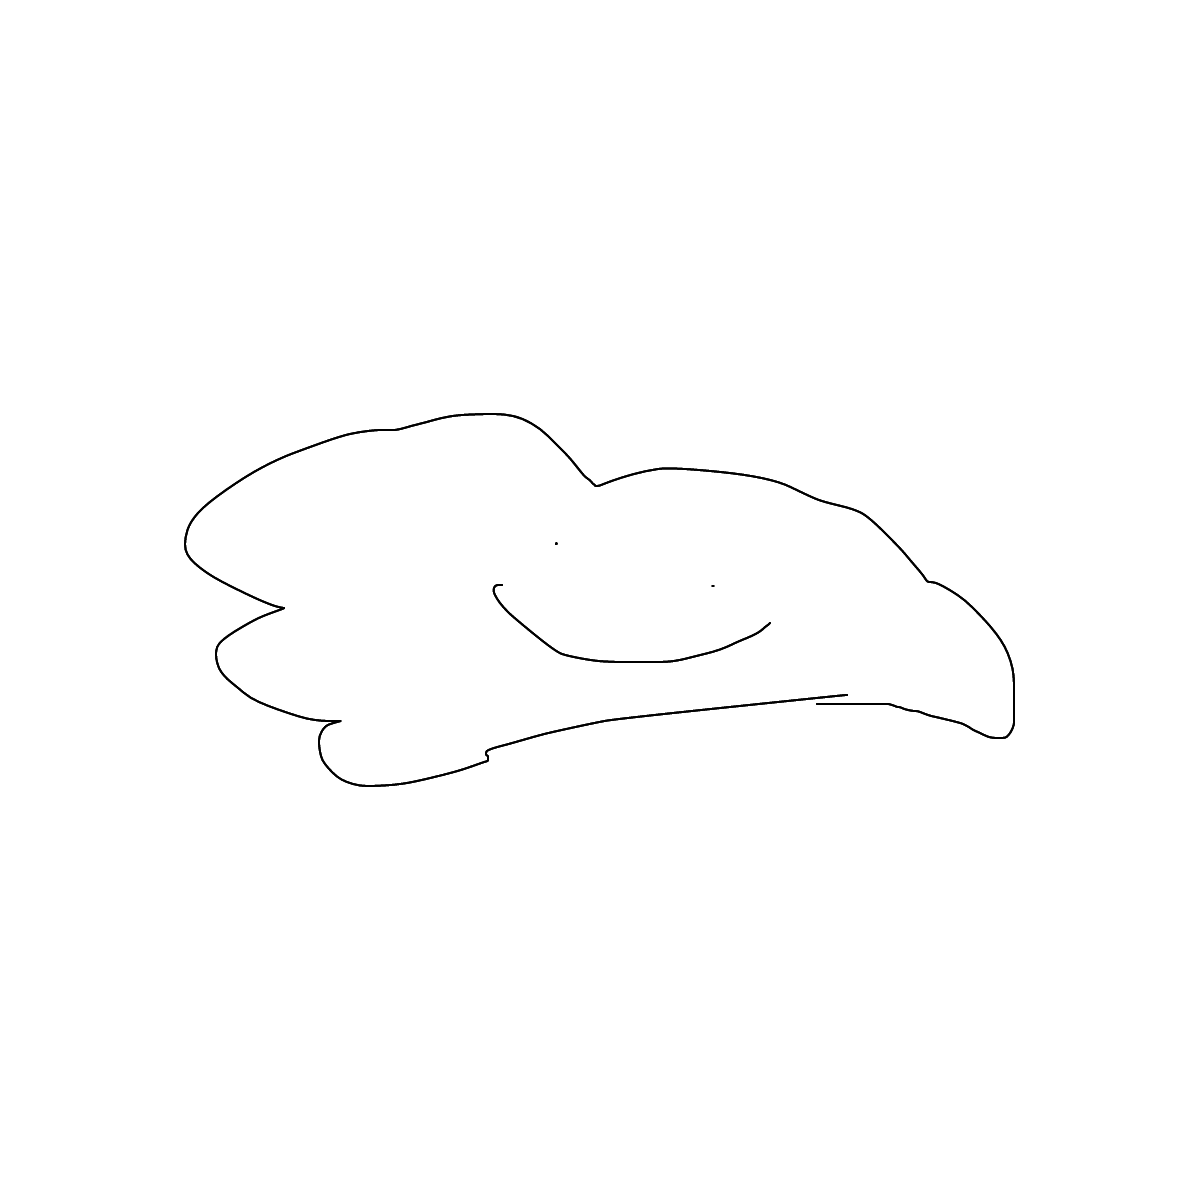 BAAAM drawing#3052 lat:29.7277984619140620lng: -95.4020385742187500